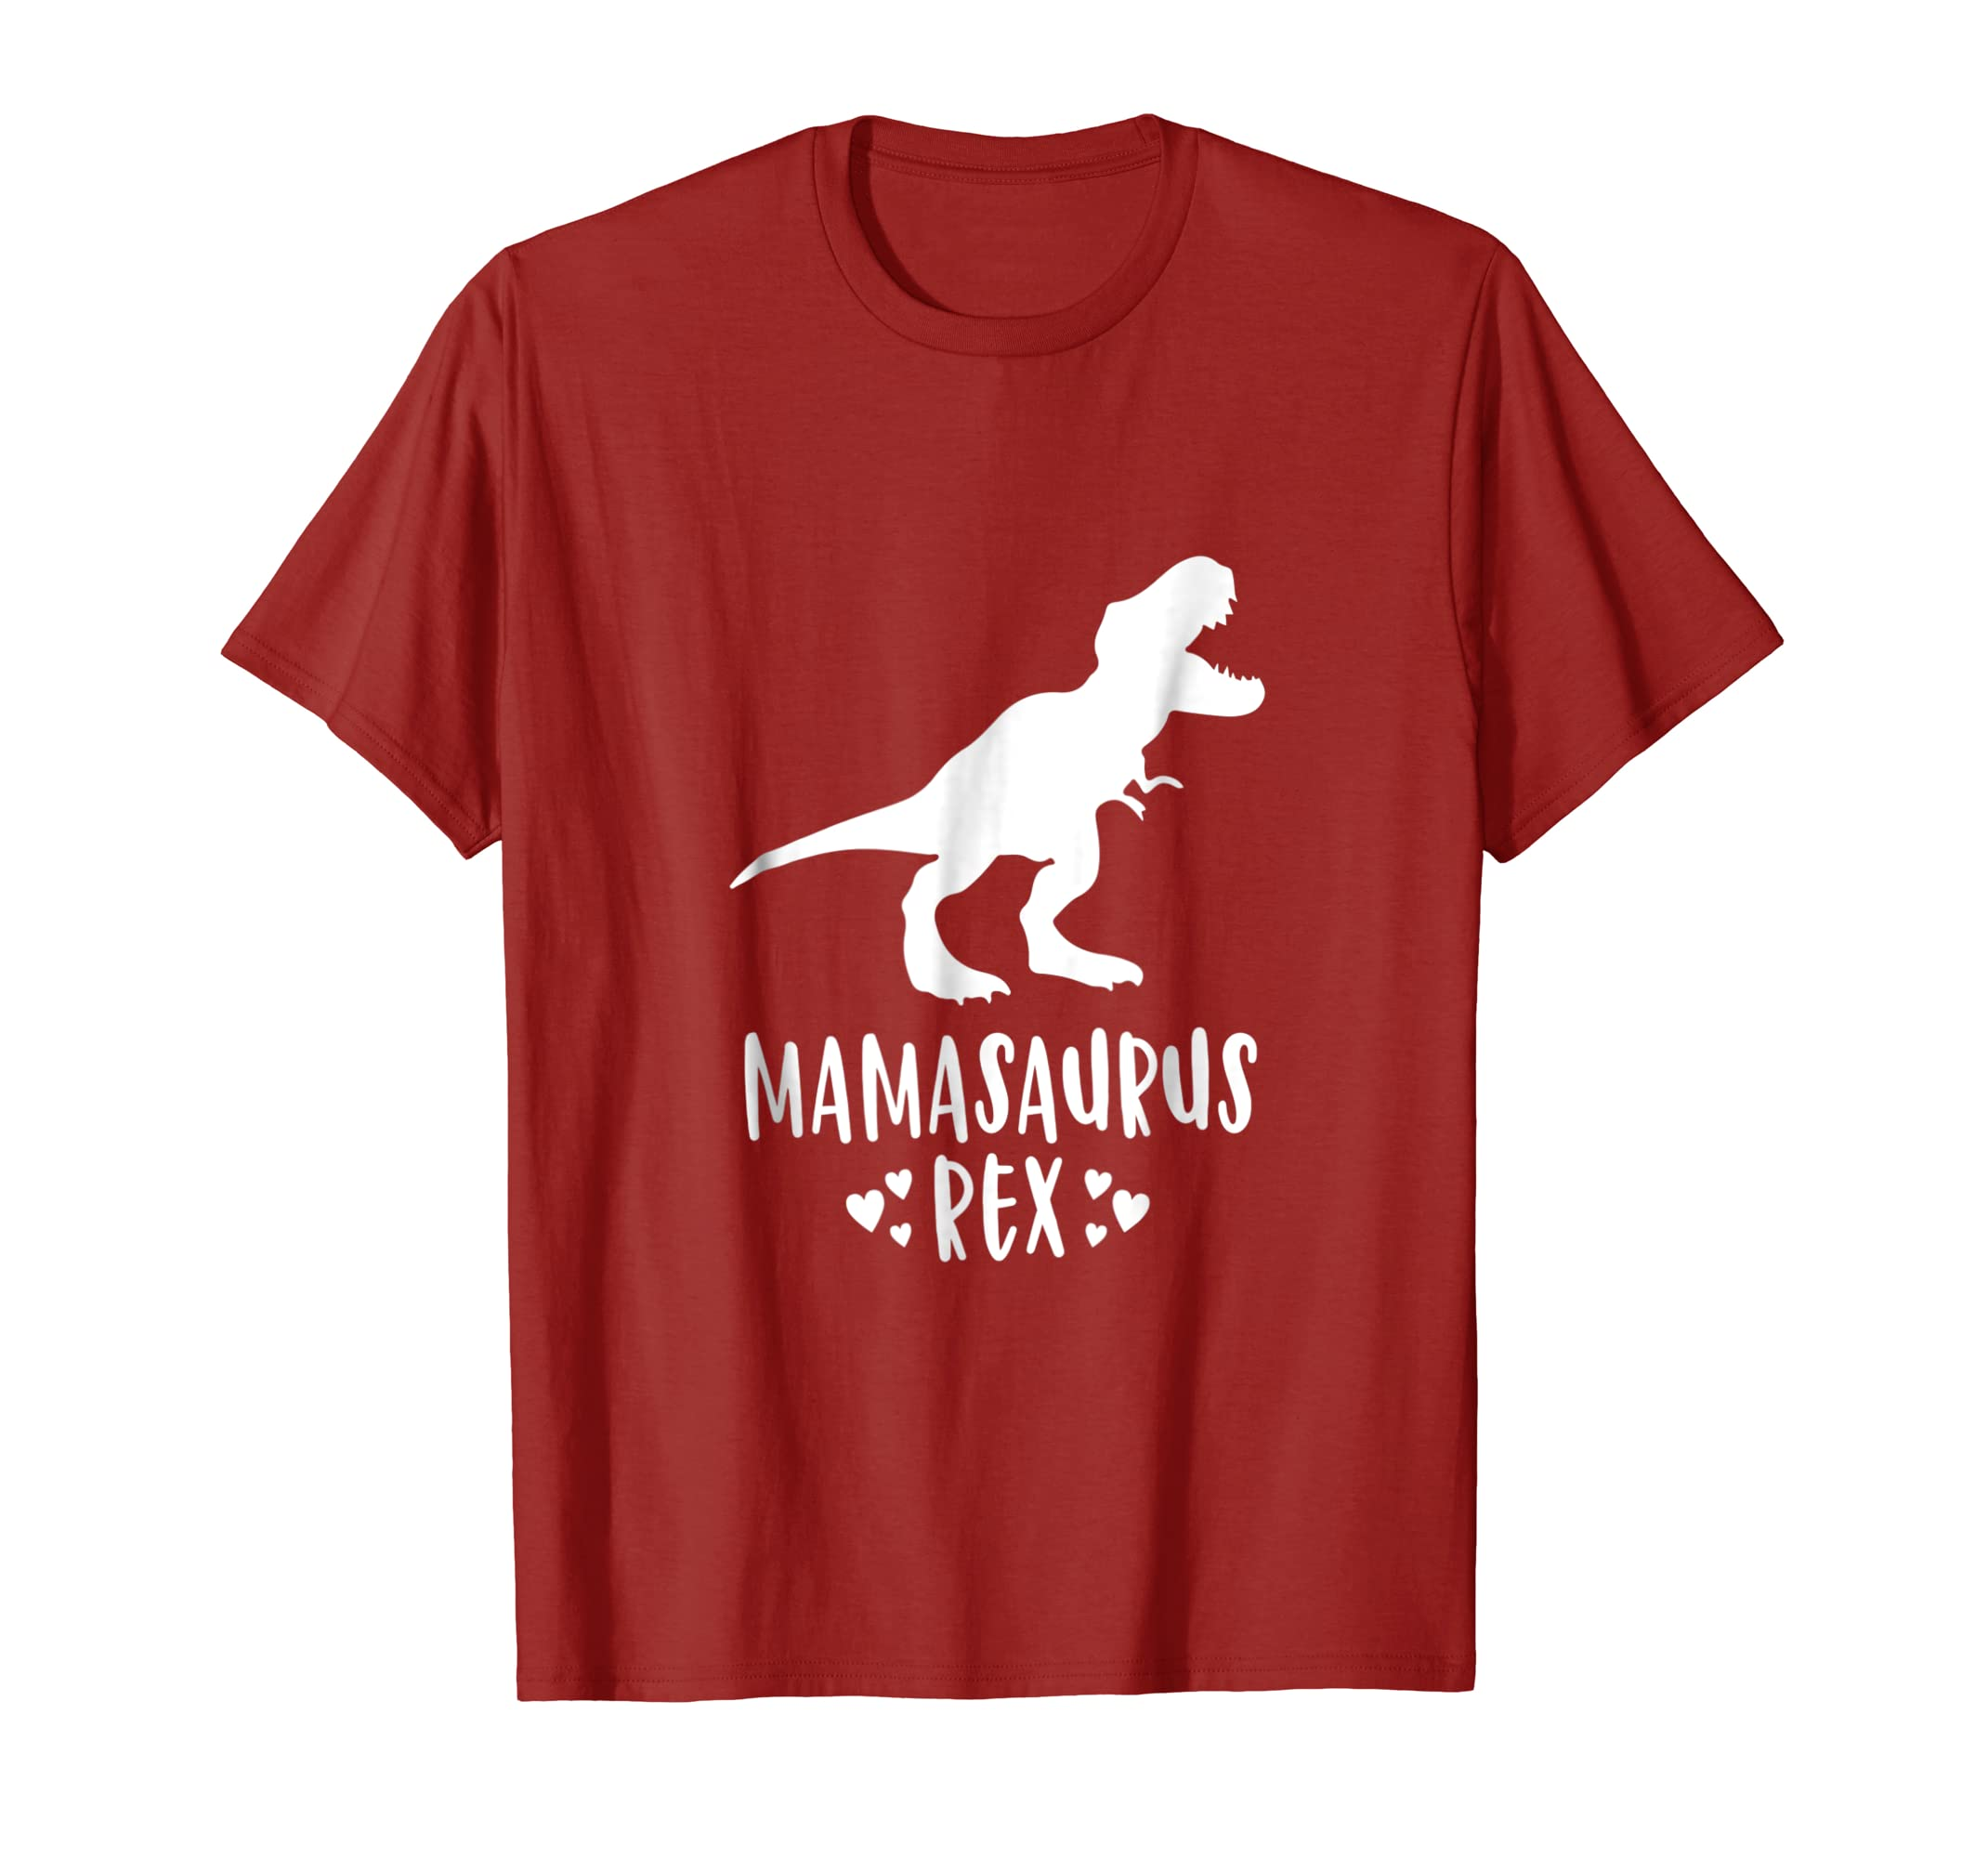 Mamasaurus Dinosaur T Shirt Rex Mother Day For Mom Gift Mama-Teehay